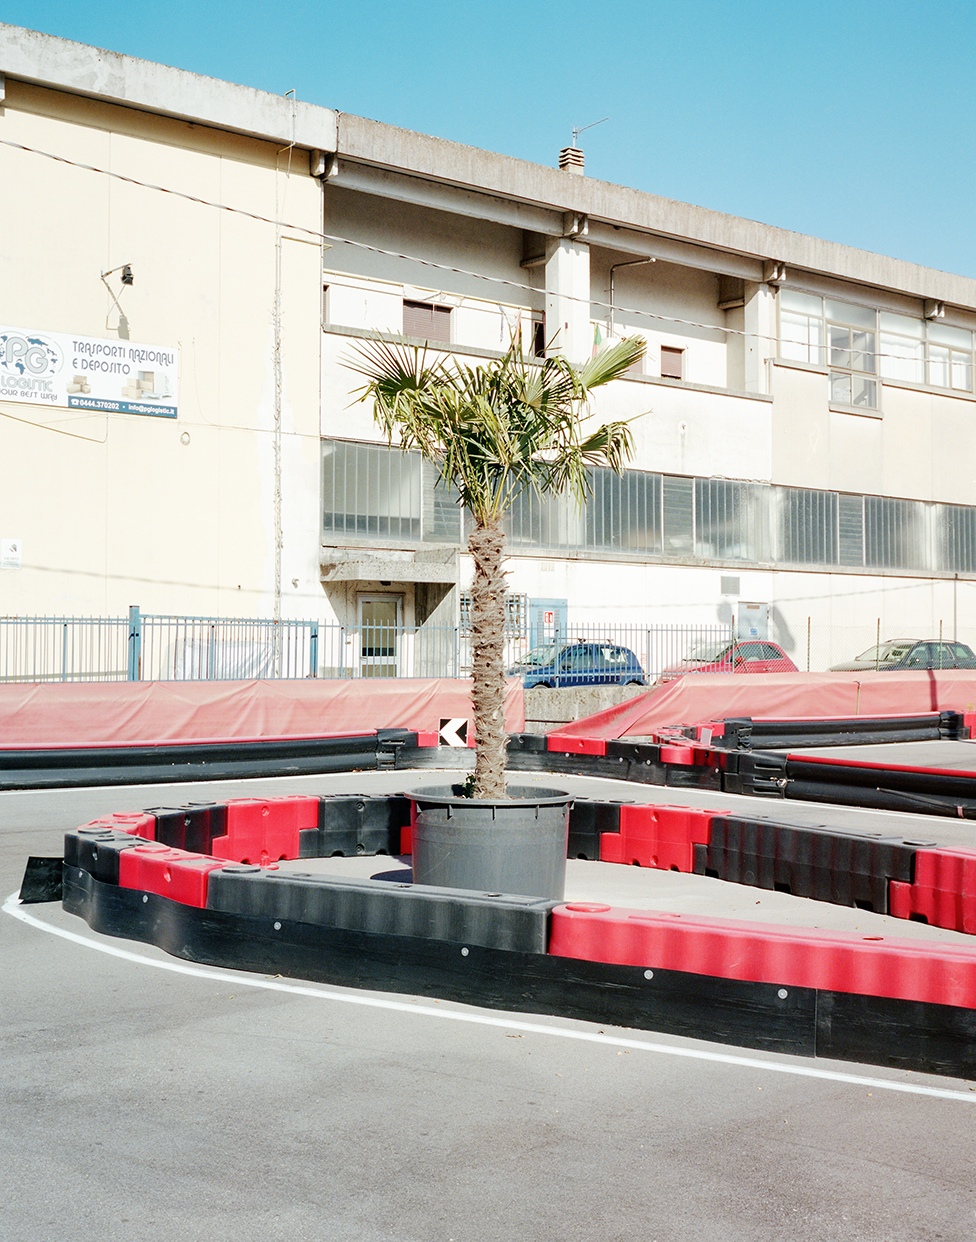 Tavernelle, 2018, ItalyA go kart track along the Padana Superiore road nearby Vicenza